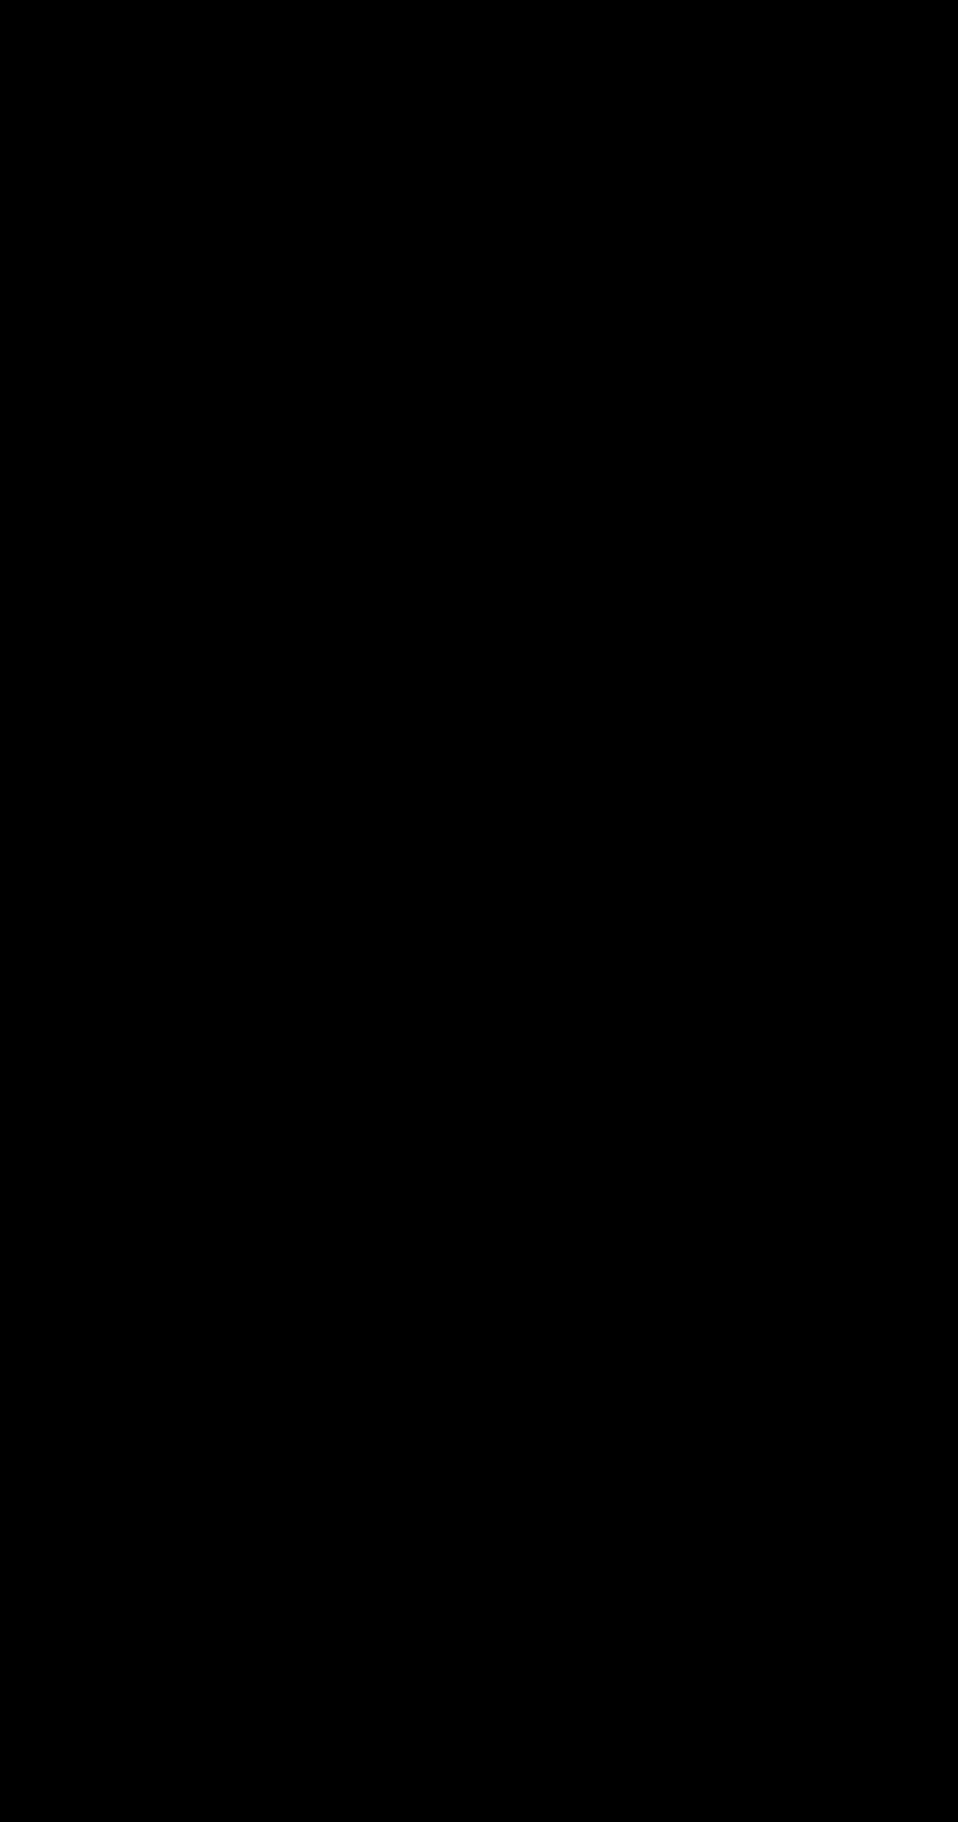 Clipart walking black cat. Free stock photo illustration